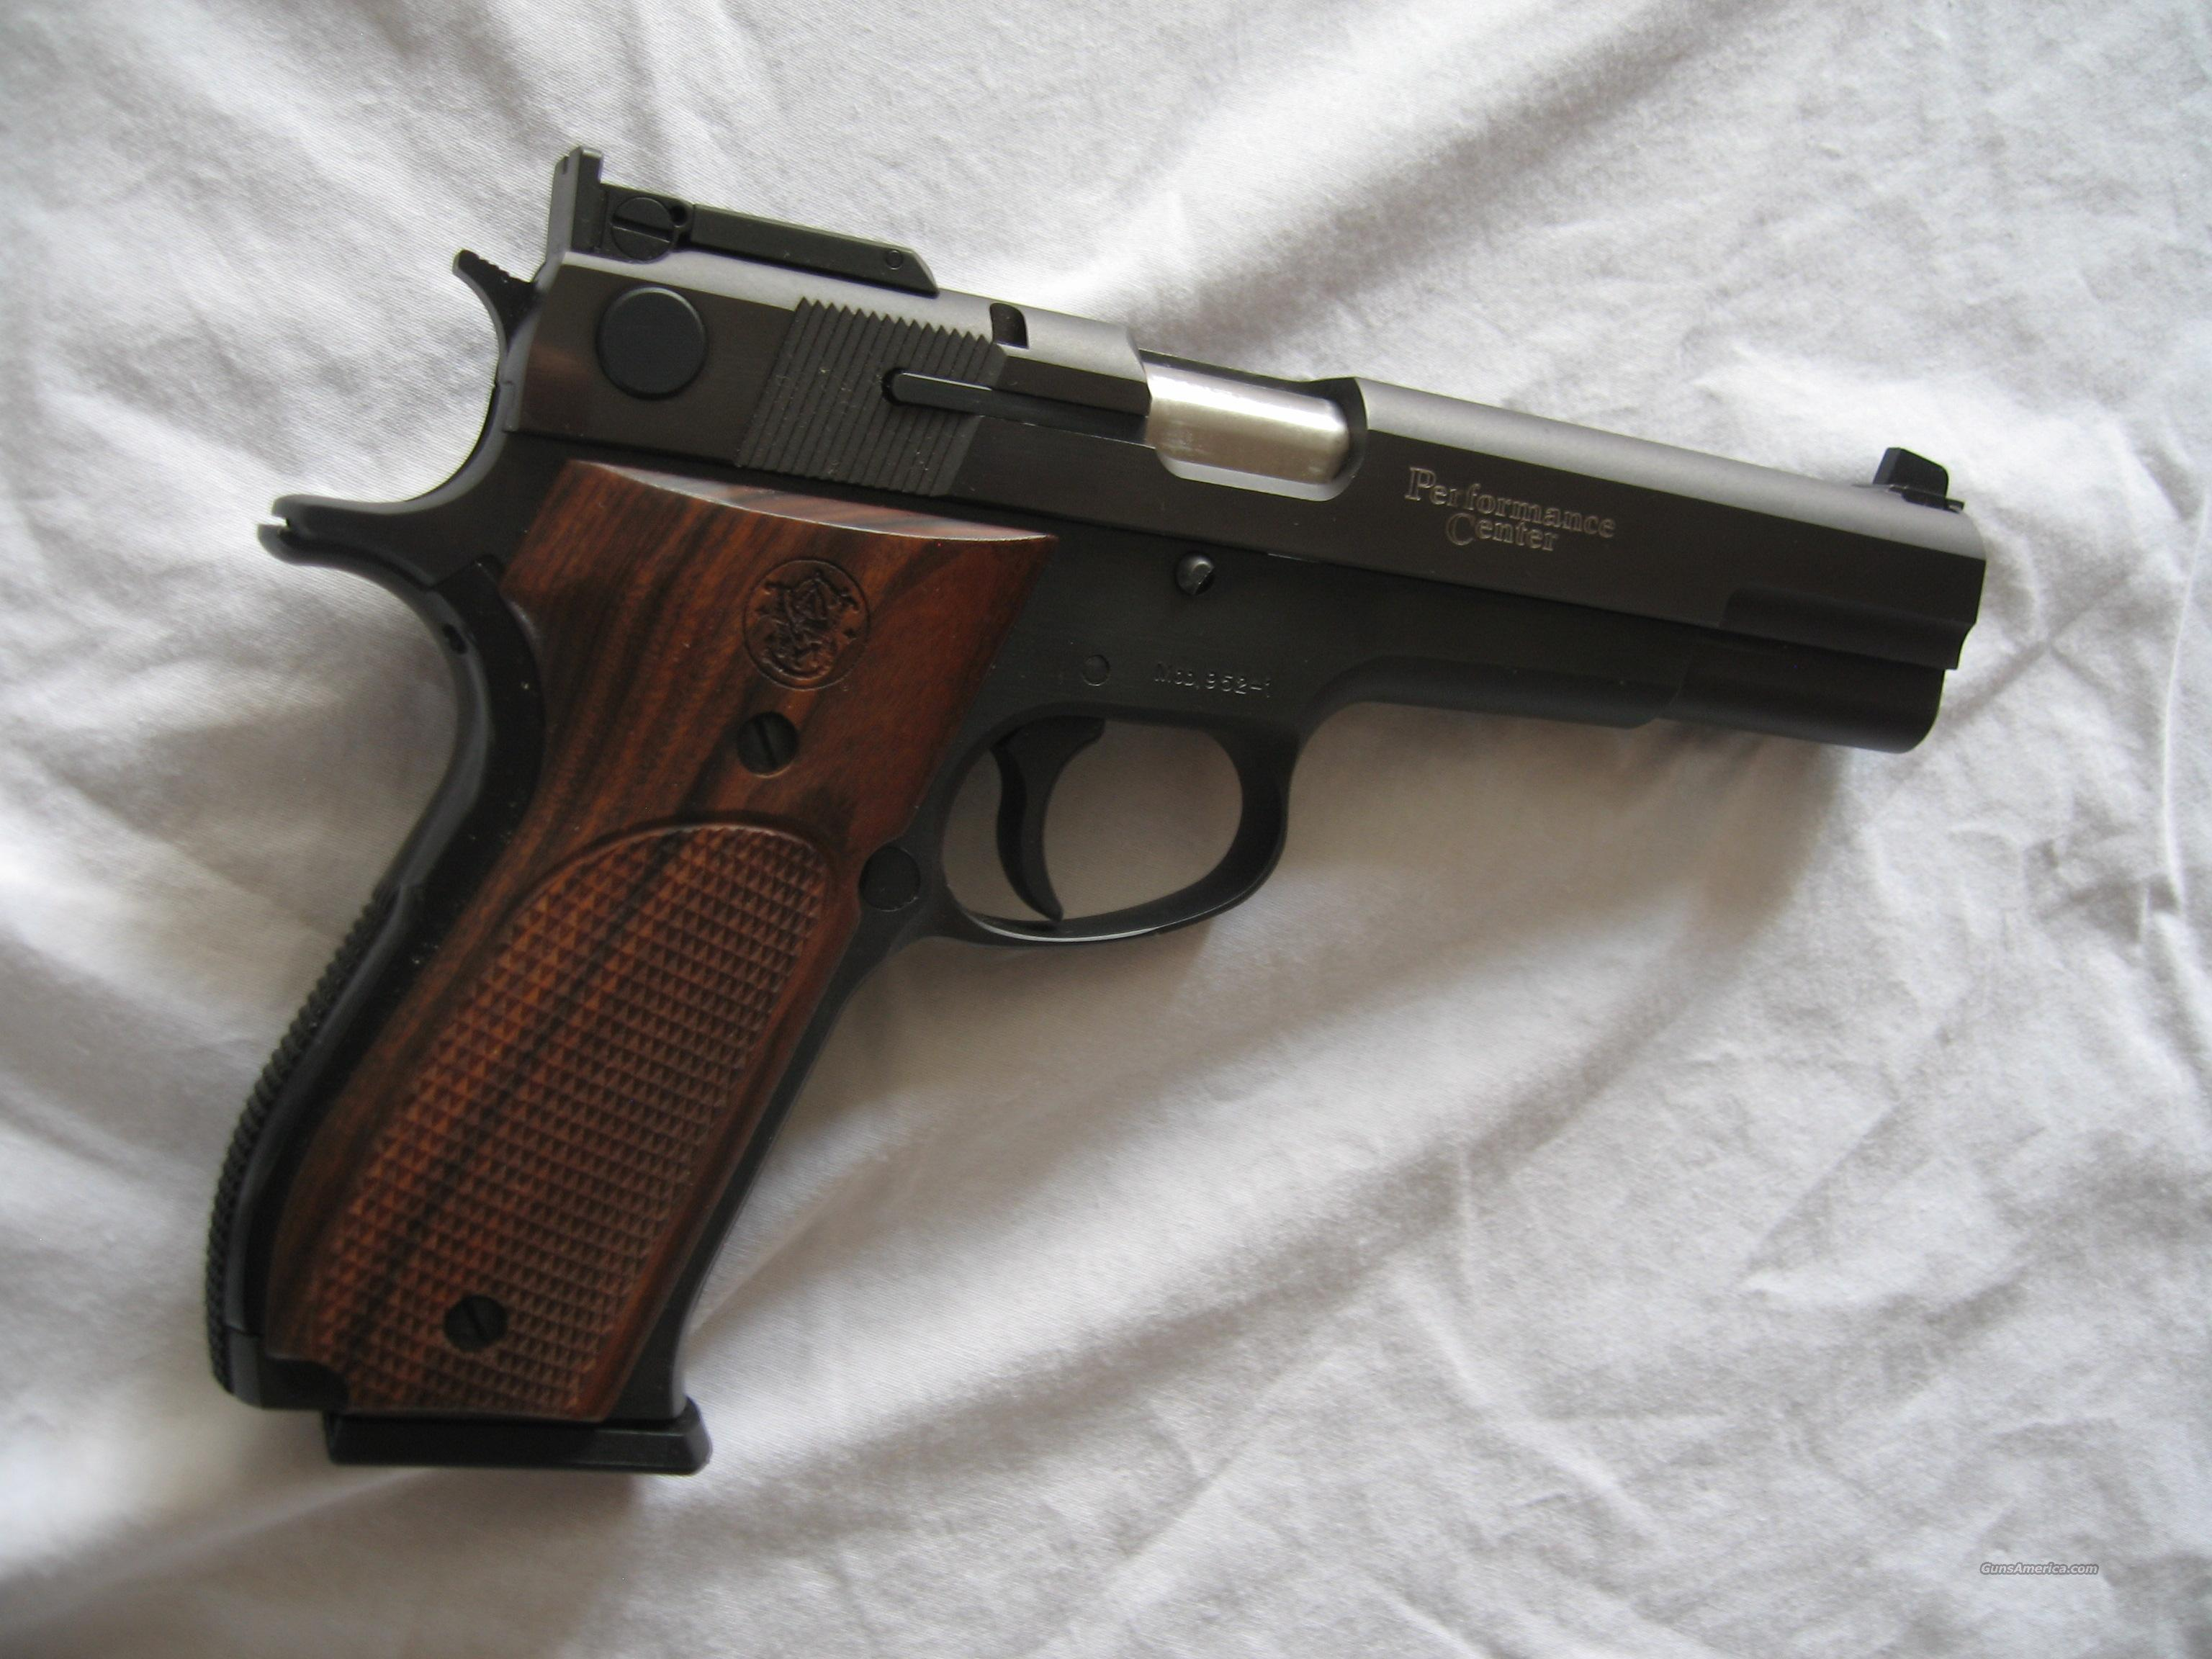 S&W mod. 952-1 PC 9mm target auto  Guns > Pistols > Smith & Wesson Pistols - Autos > Steel Frame